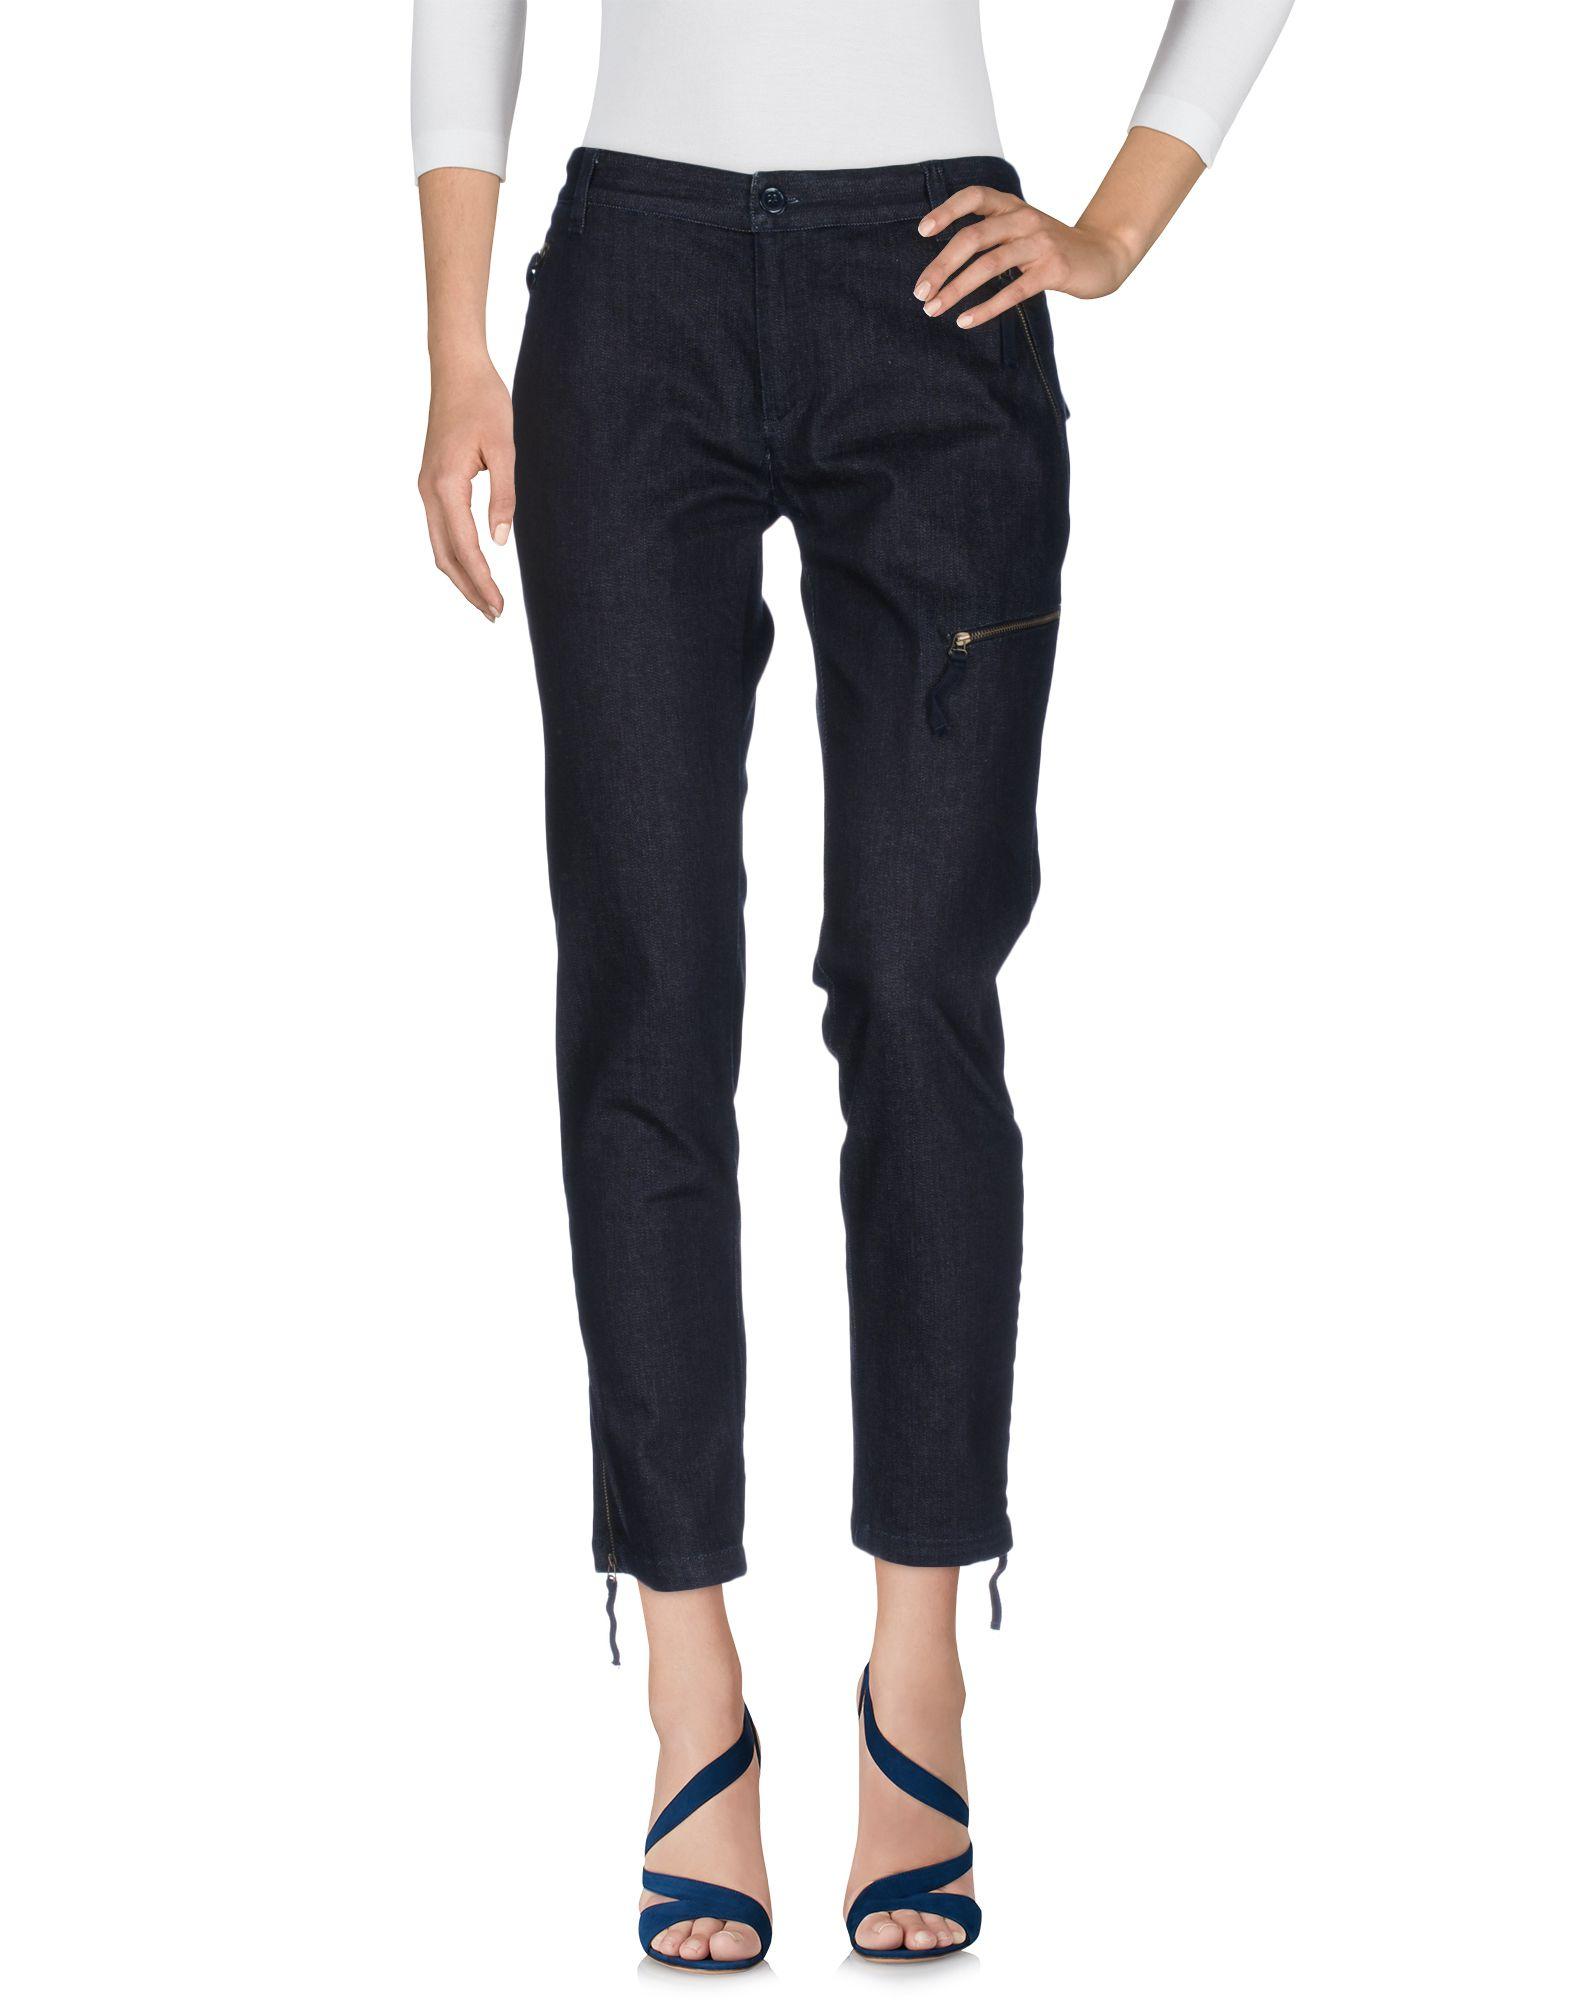 Pantaloni Jeans Coming Soon Donna - Acquista online su IqysbJz